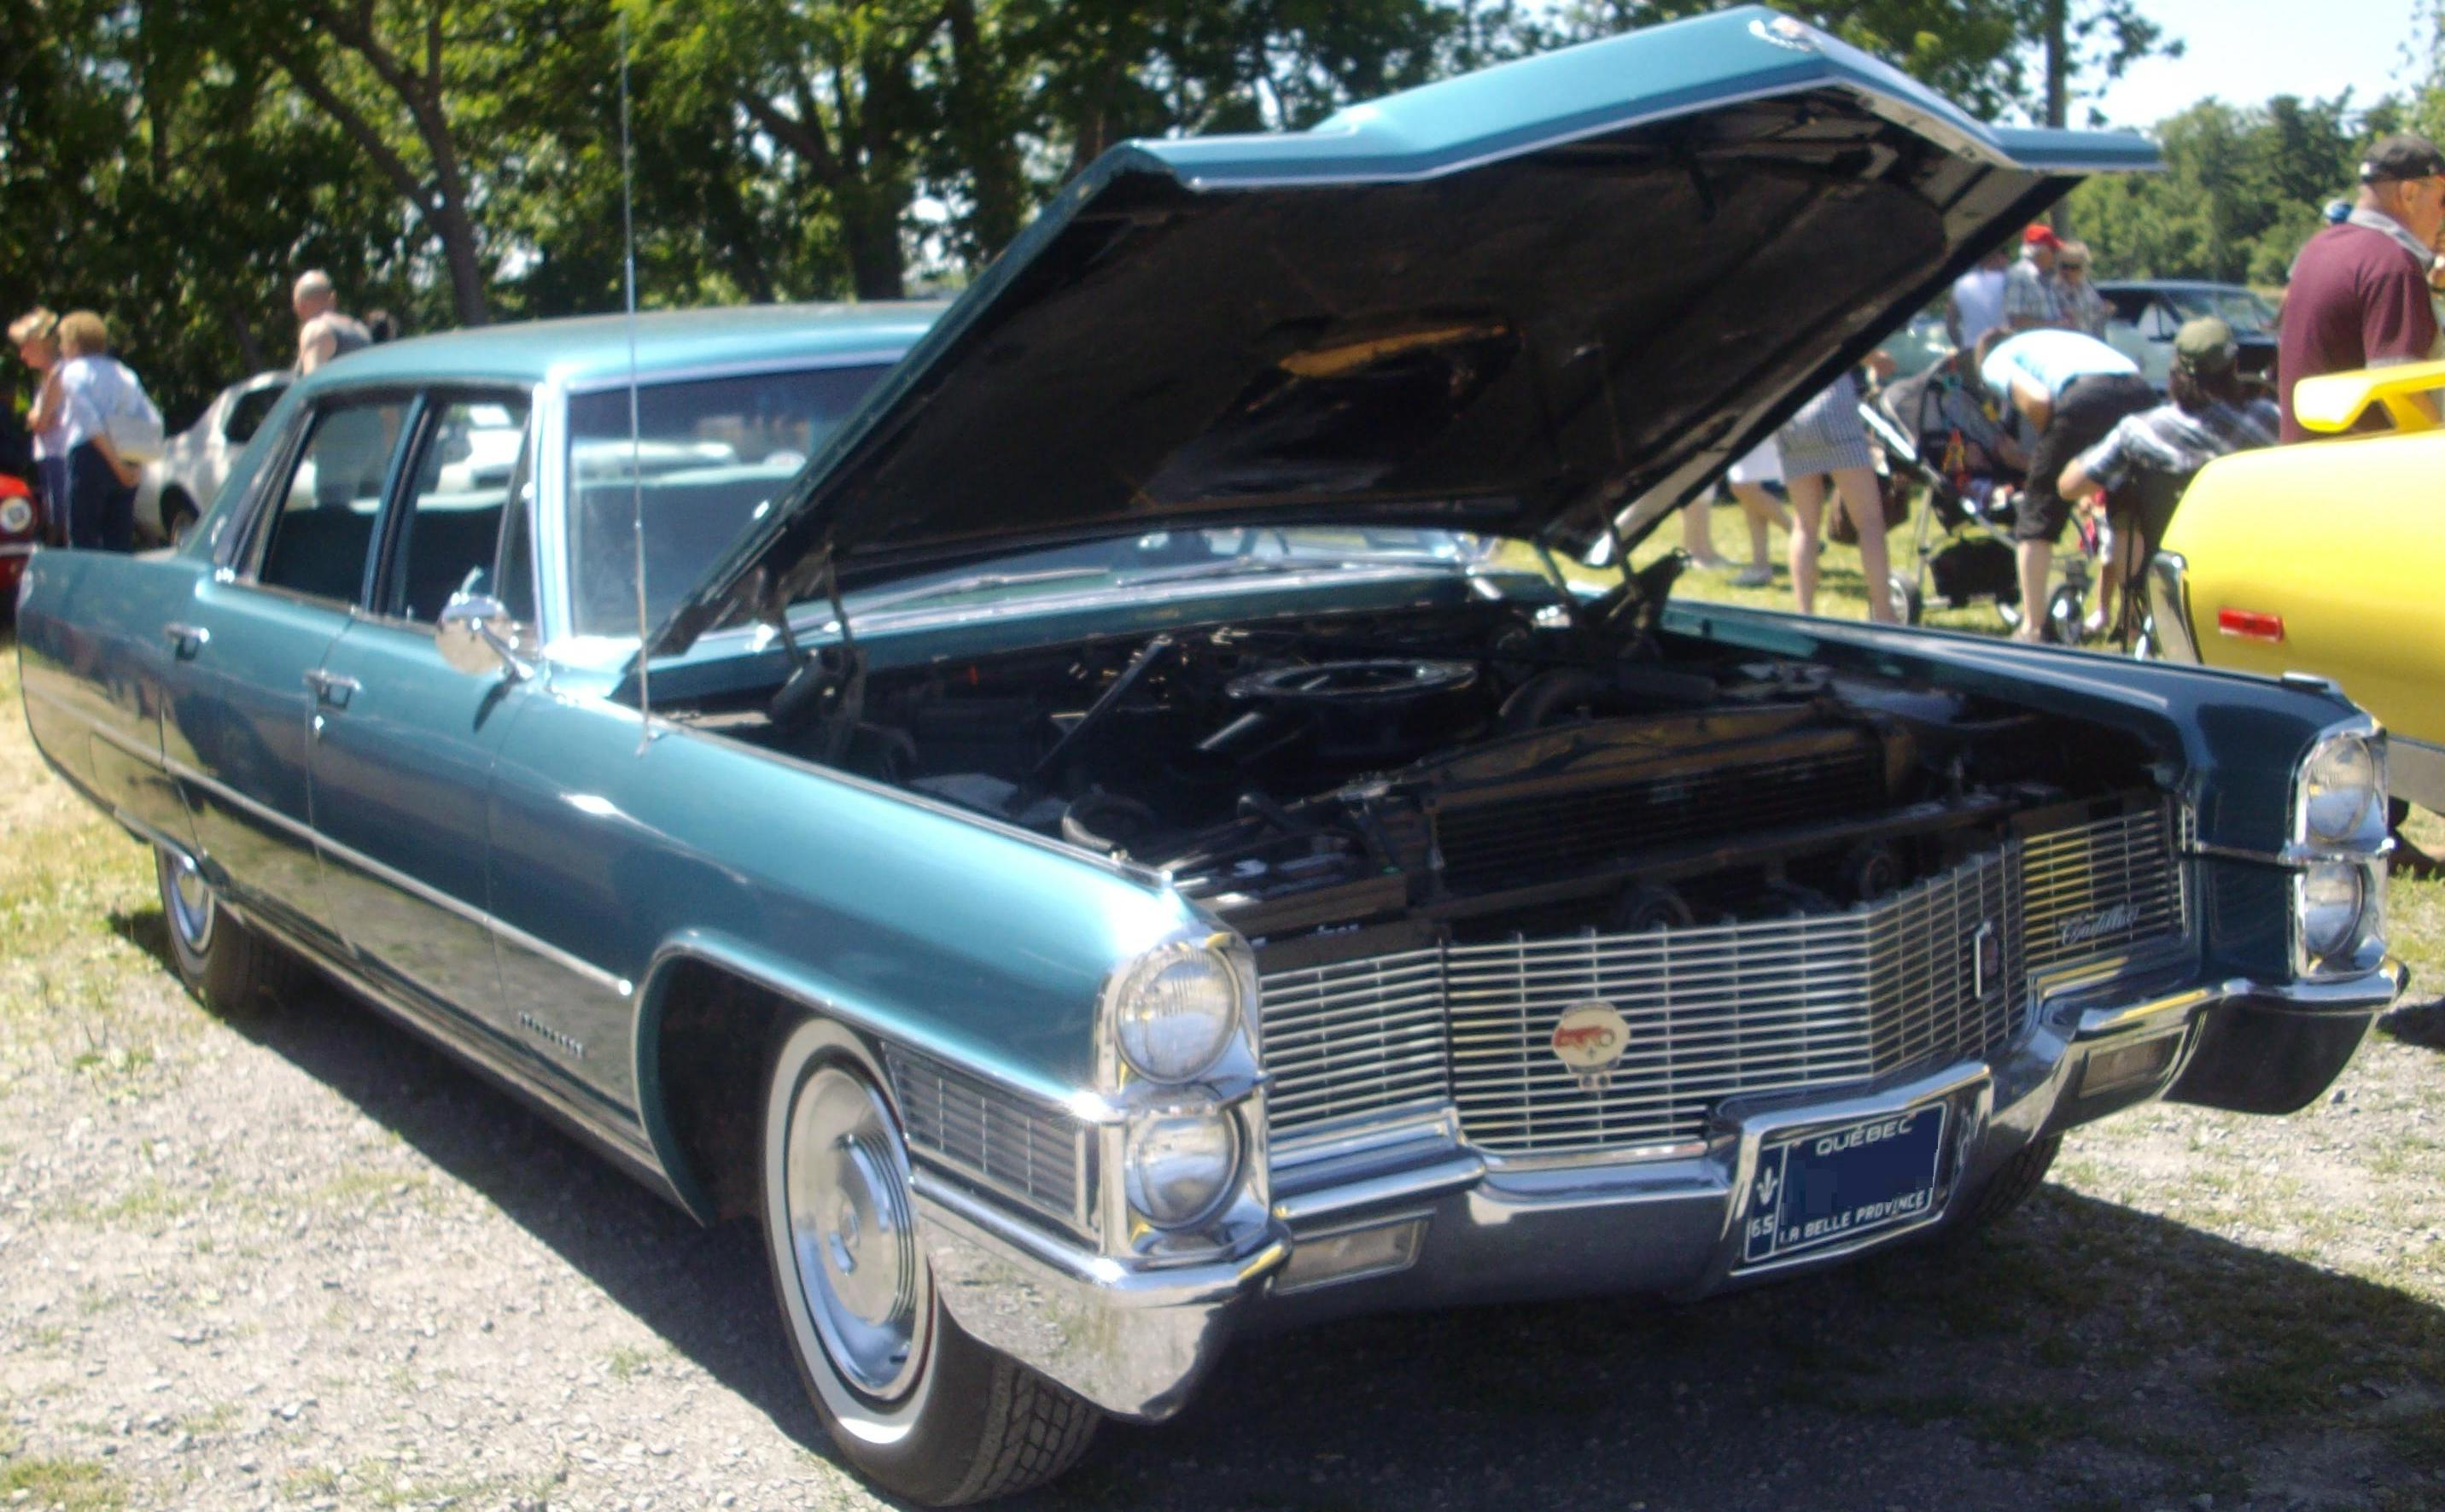 Cadillac Cars For Sale In Cincinnati Oh